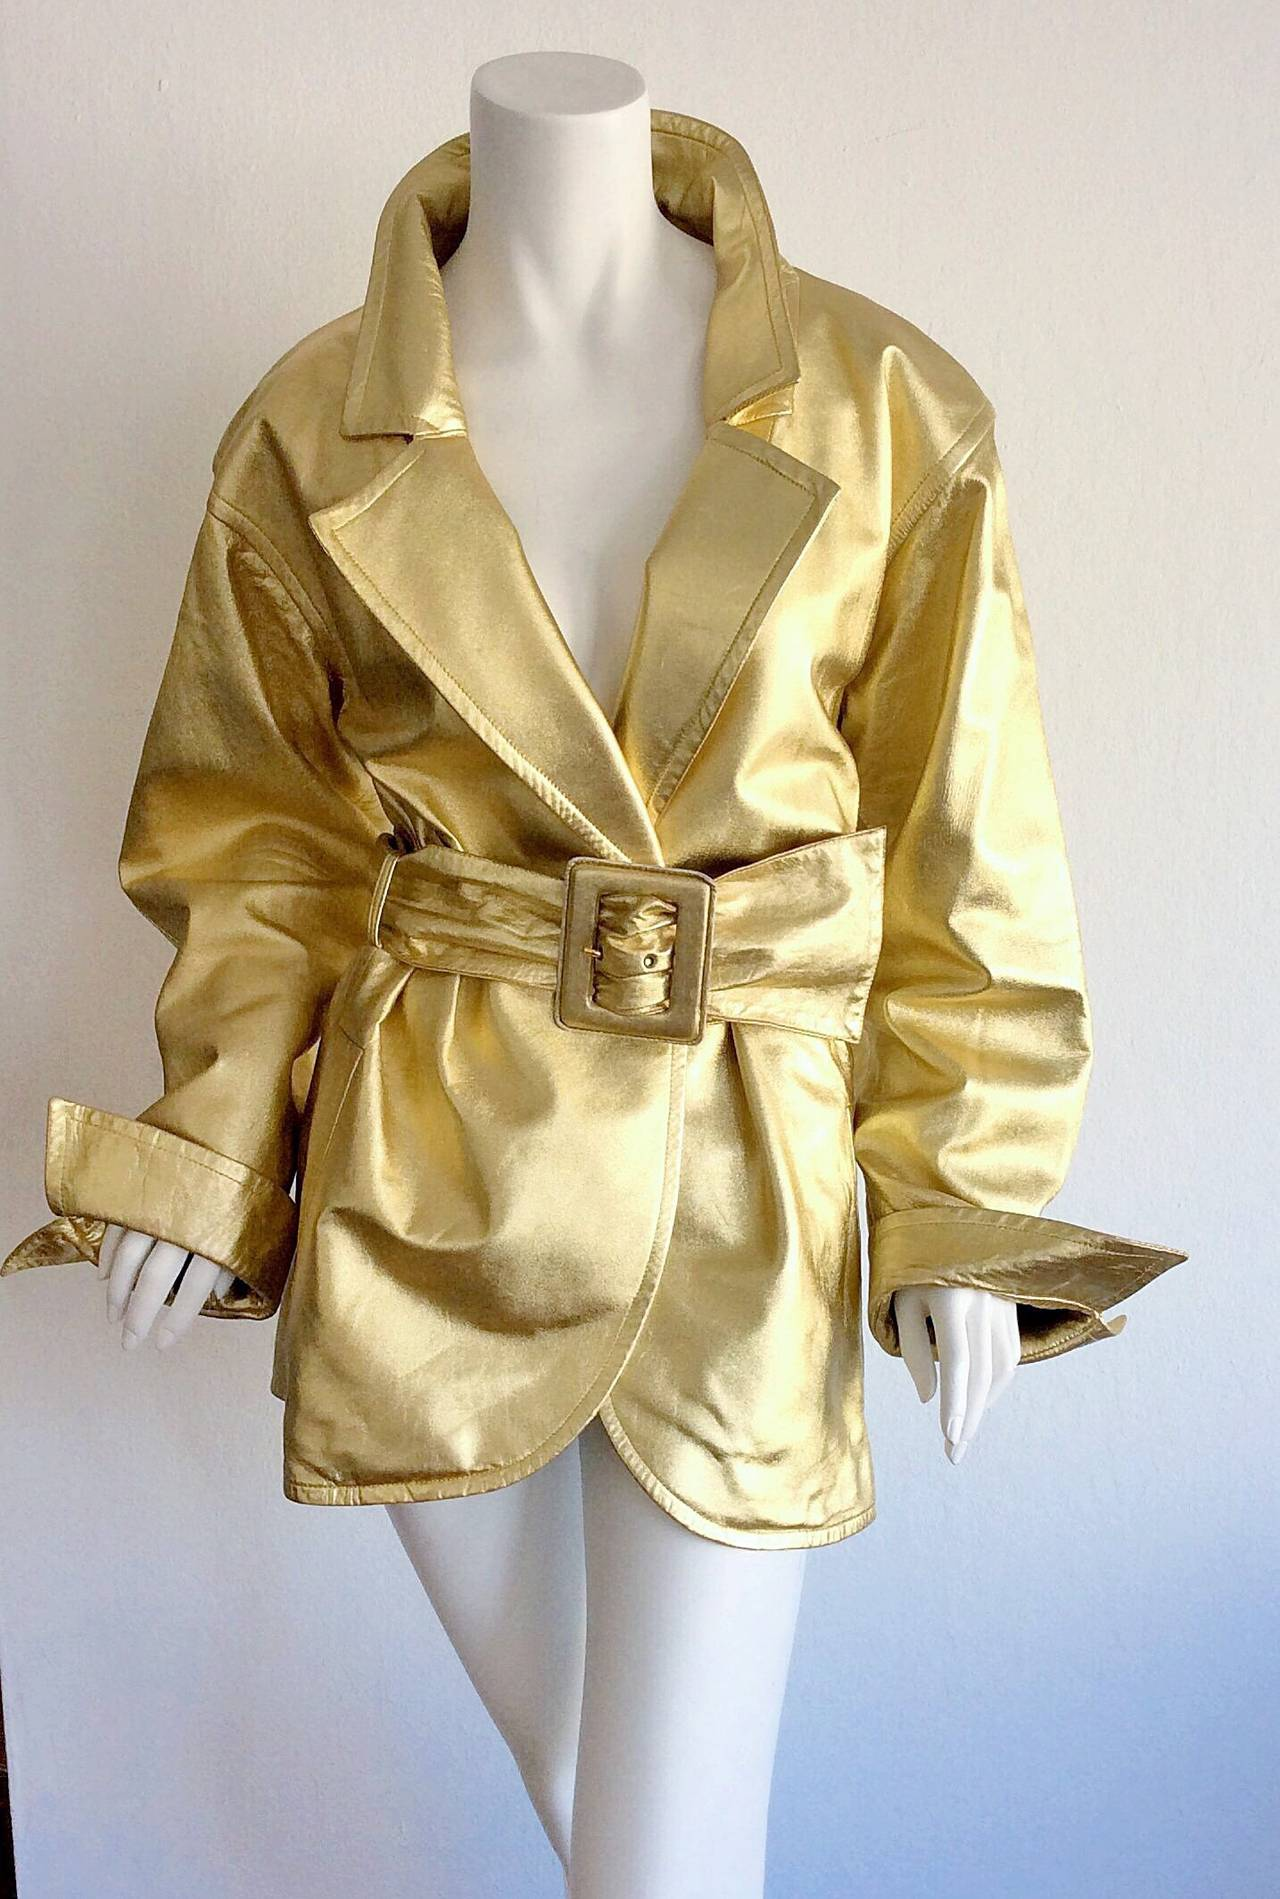 Vintage Yves Saint Laurent ' Rive Gauche ' Belted Gold Leather Jacket 3